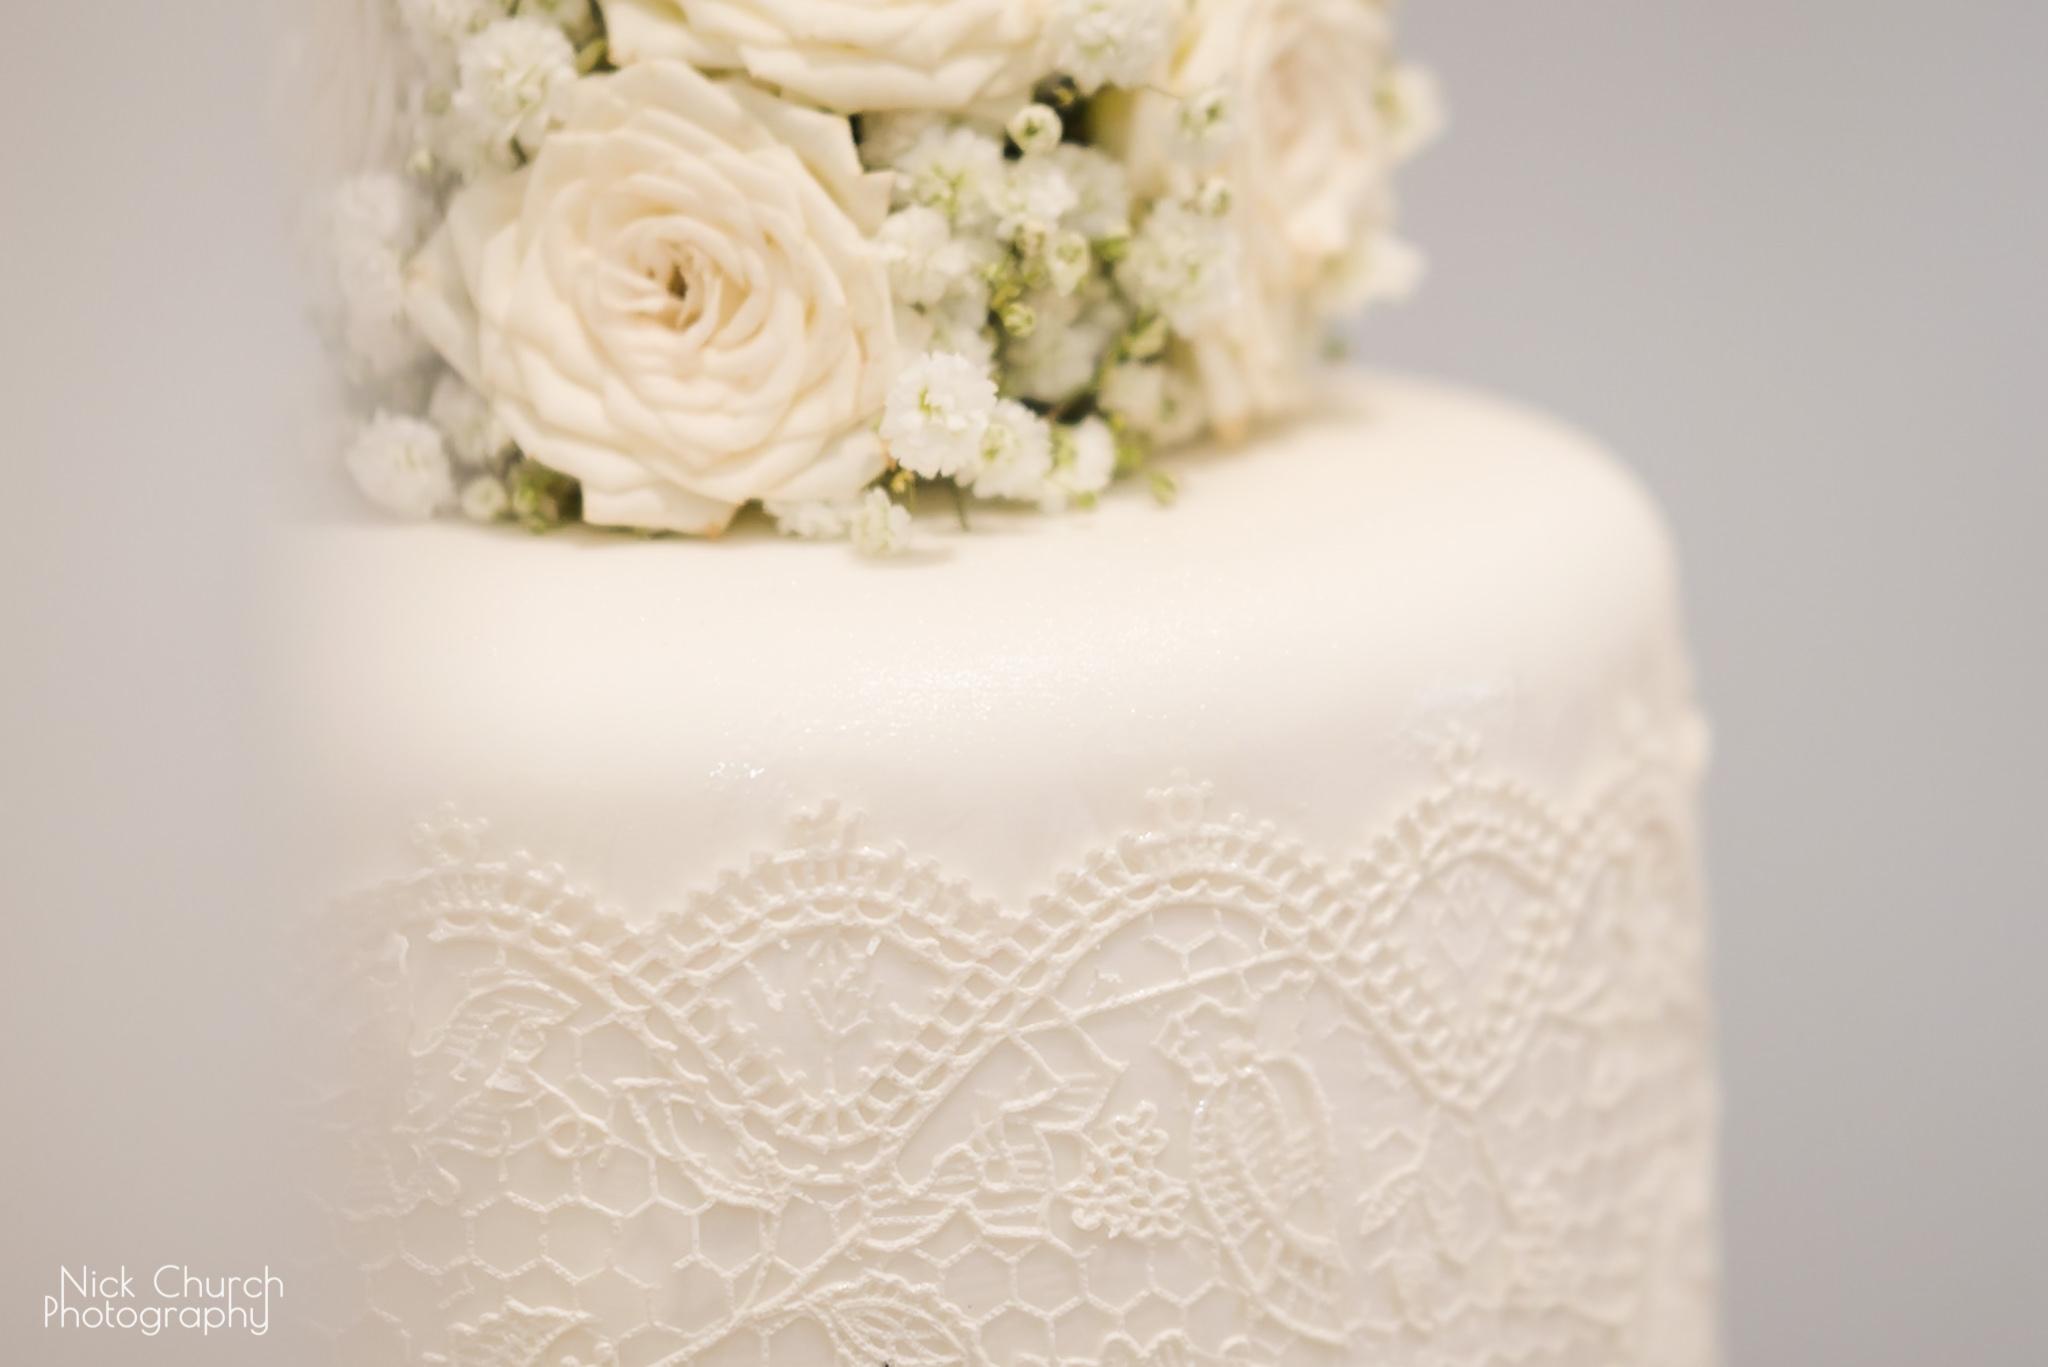 NC-20180317-stacy-and-mike-wedding-1512.jpg